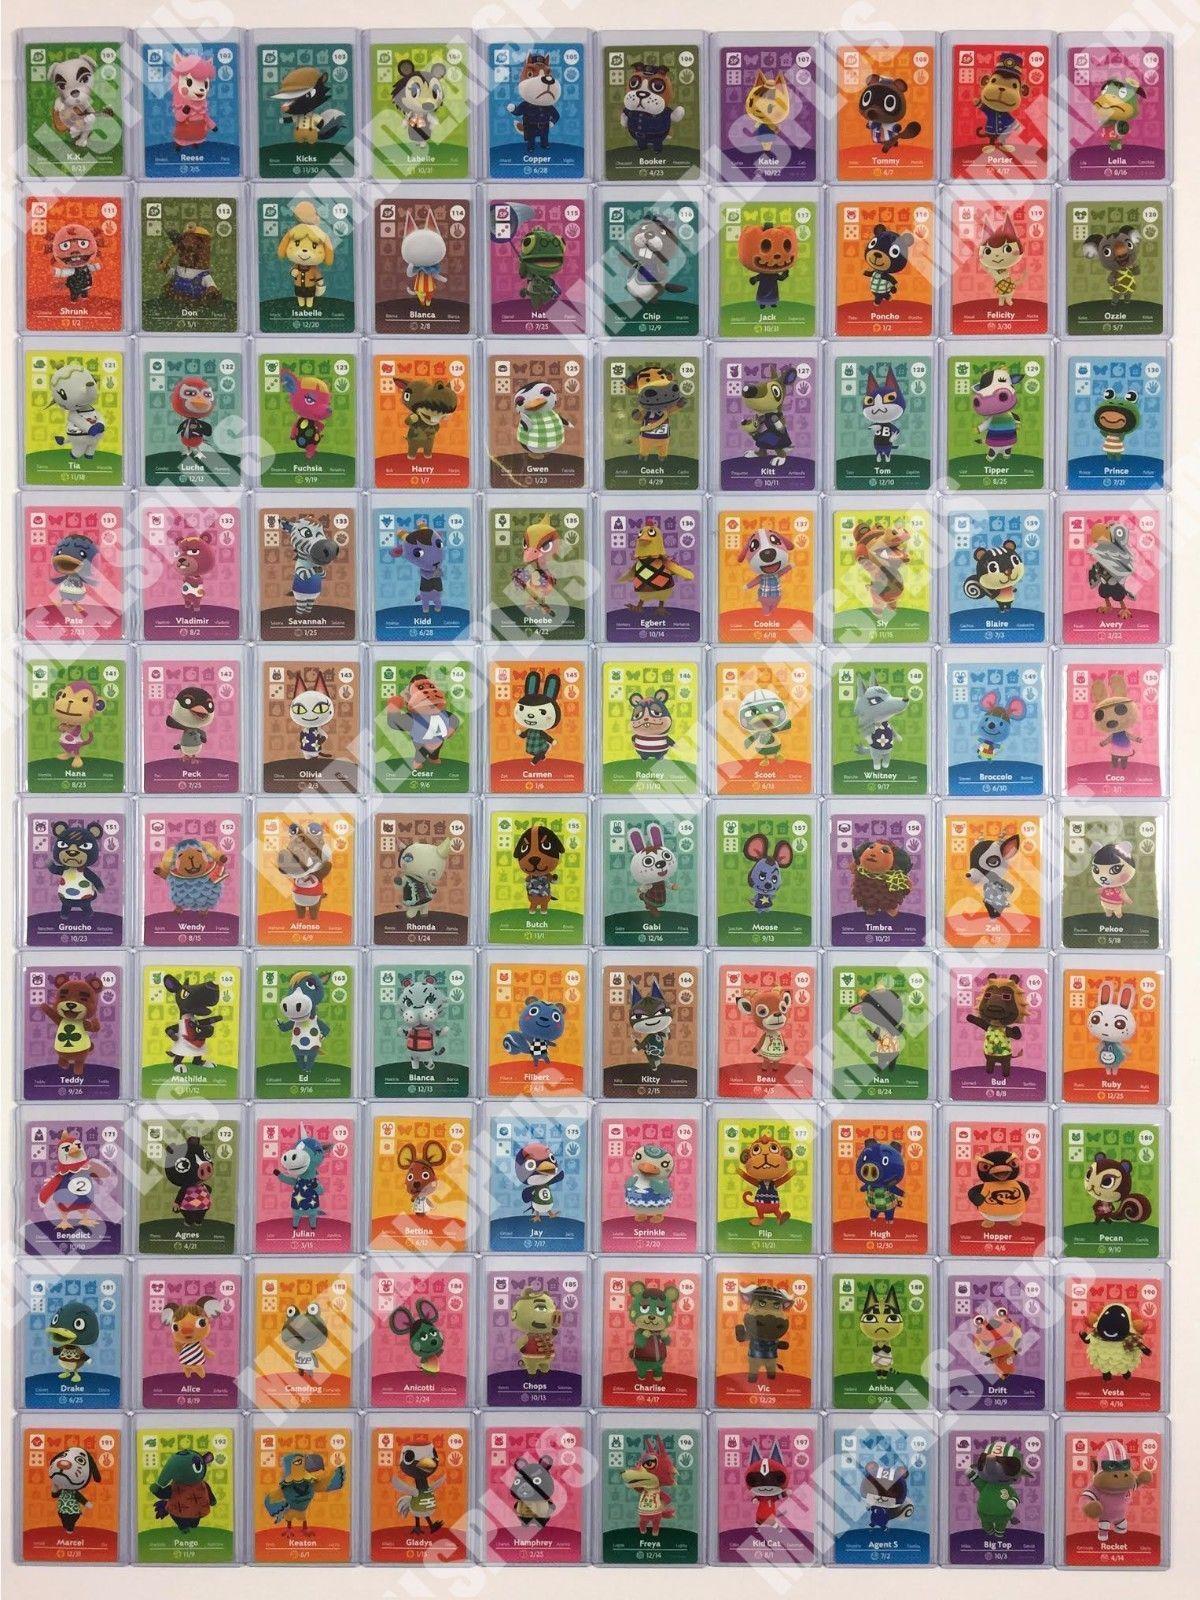 19+ Free animal crossing amiibo cards ideas